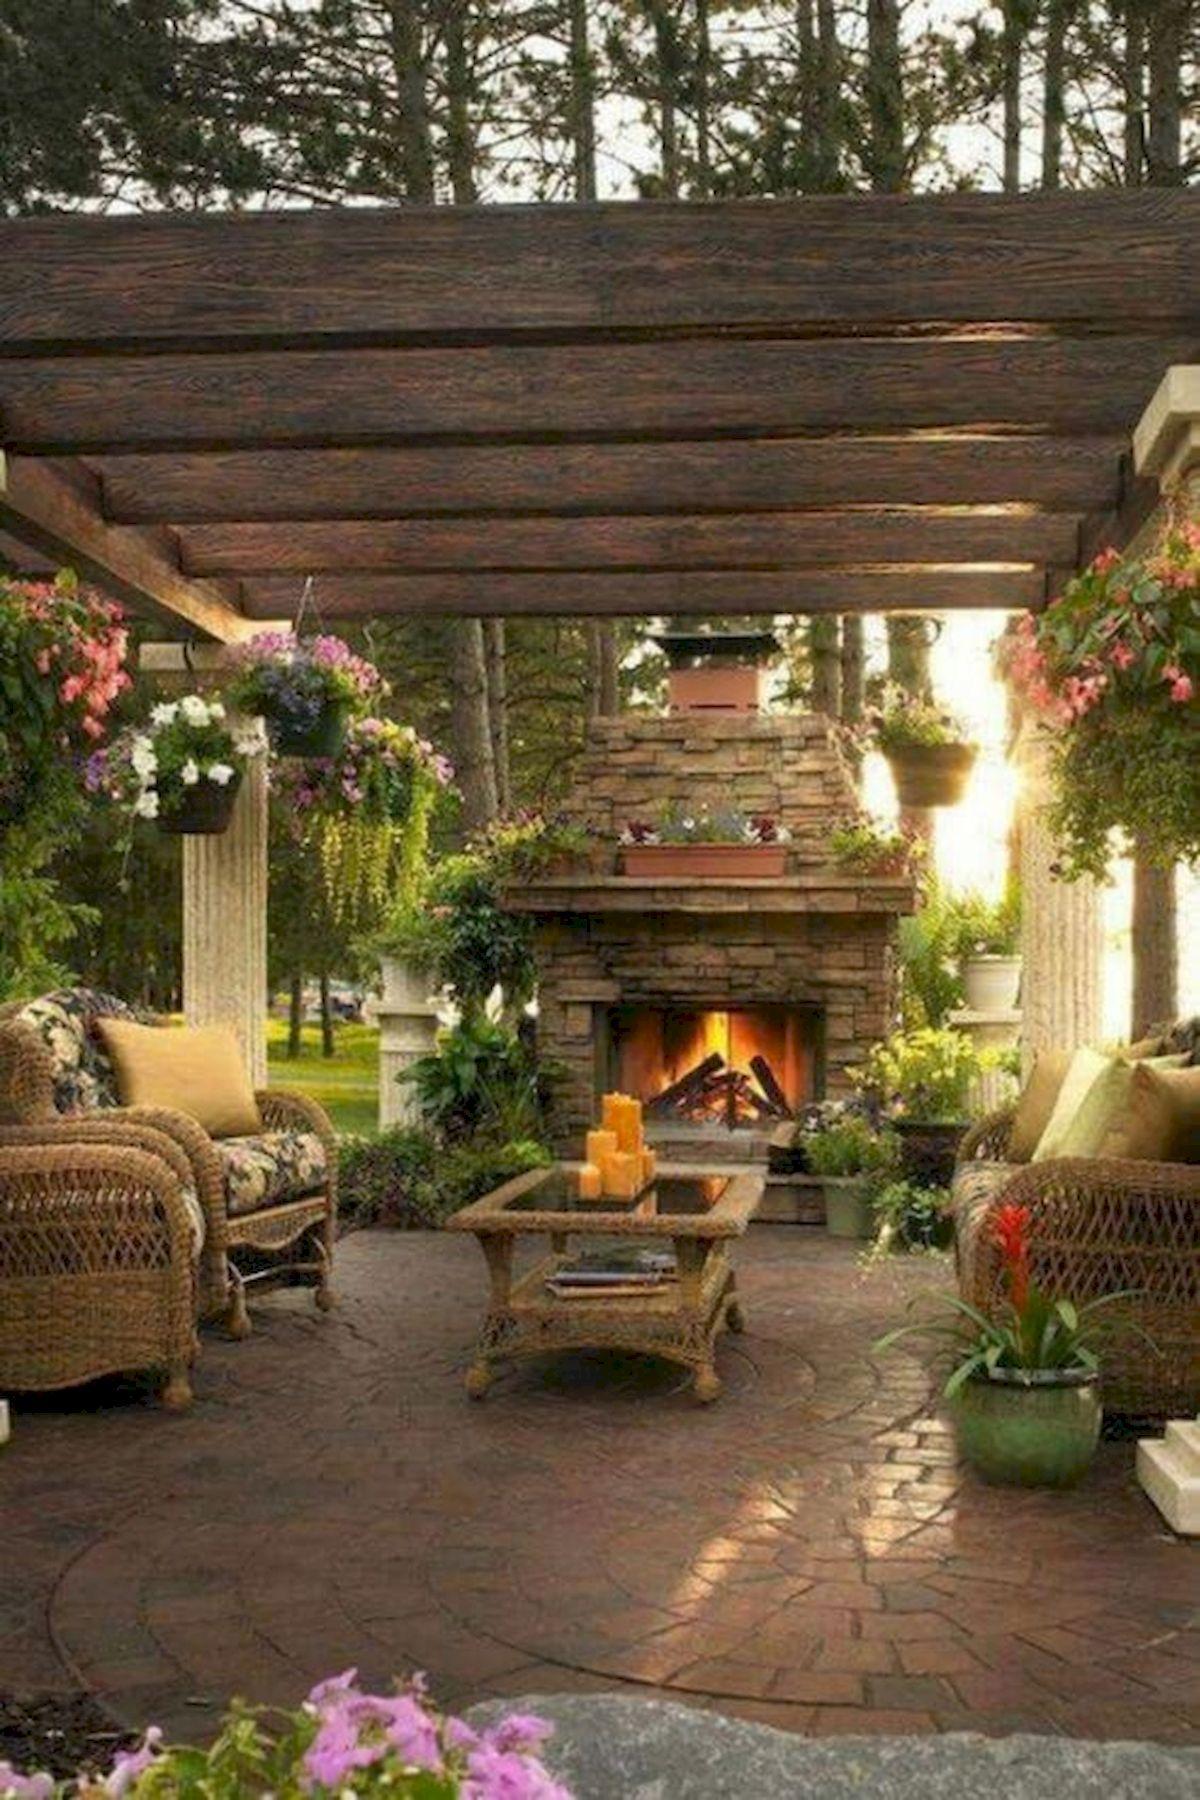 50 Awesome DIY Hanging Plants Ideas For Modern Backyard Garden (34)